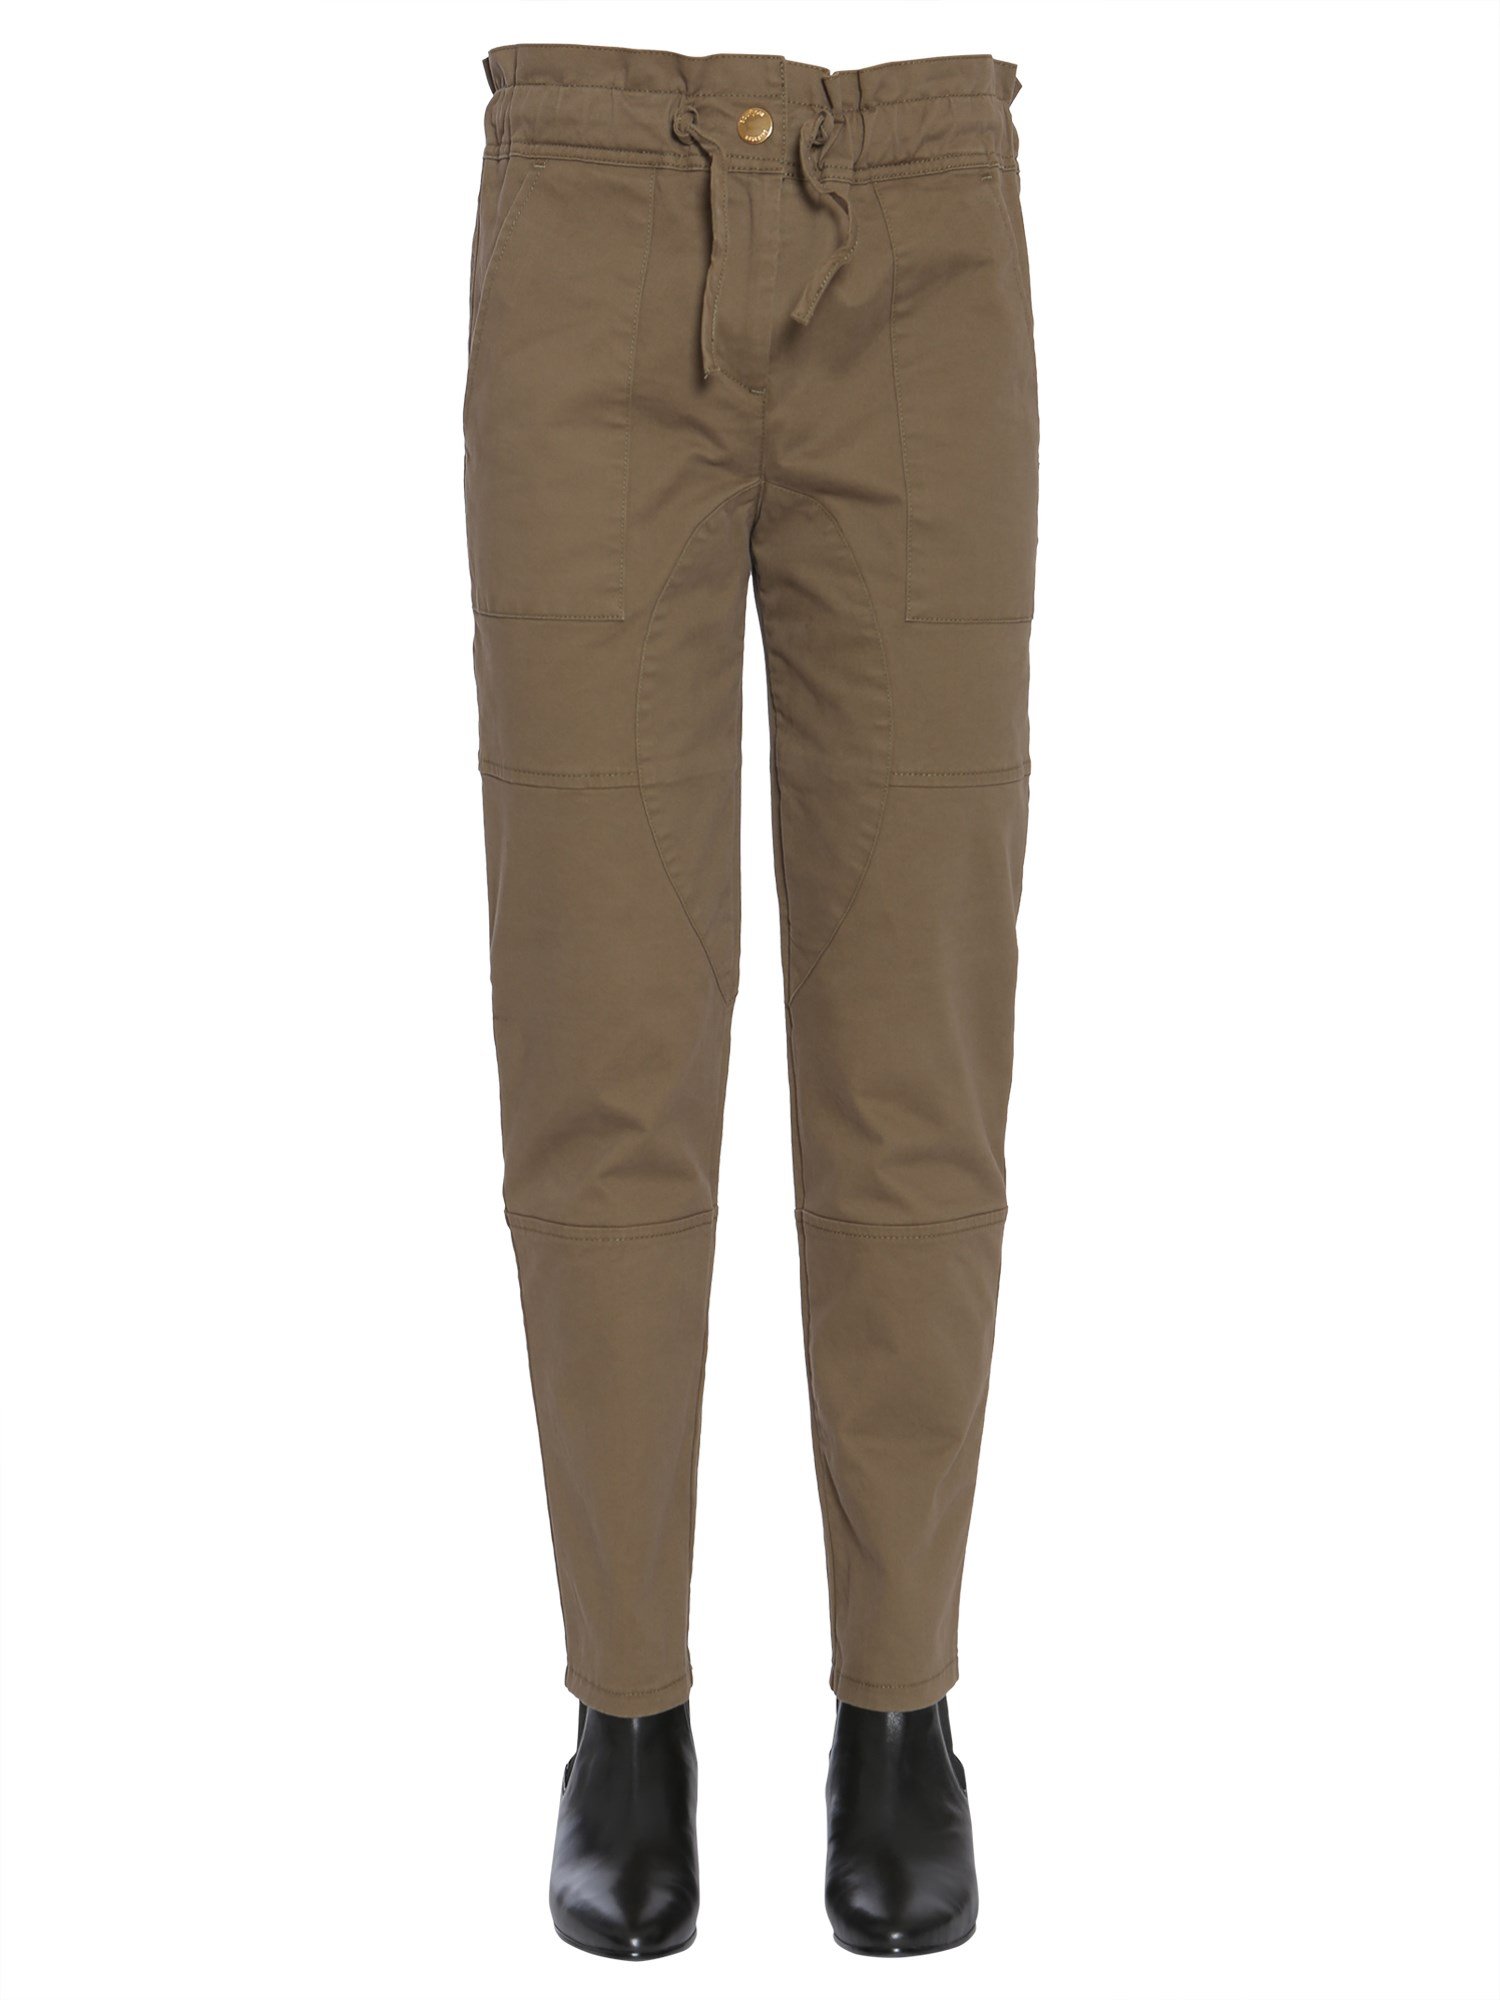 Cotton gabardine trousers - boutique moschino - Modalova